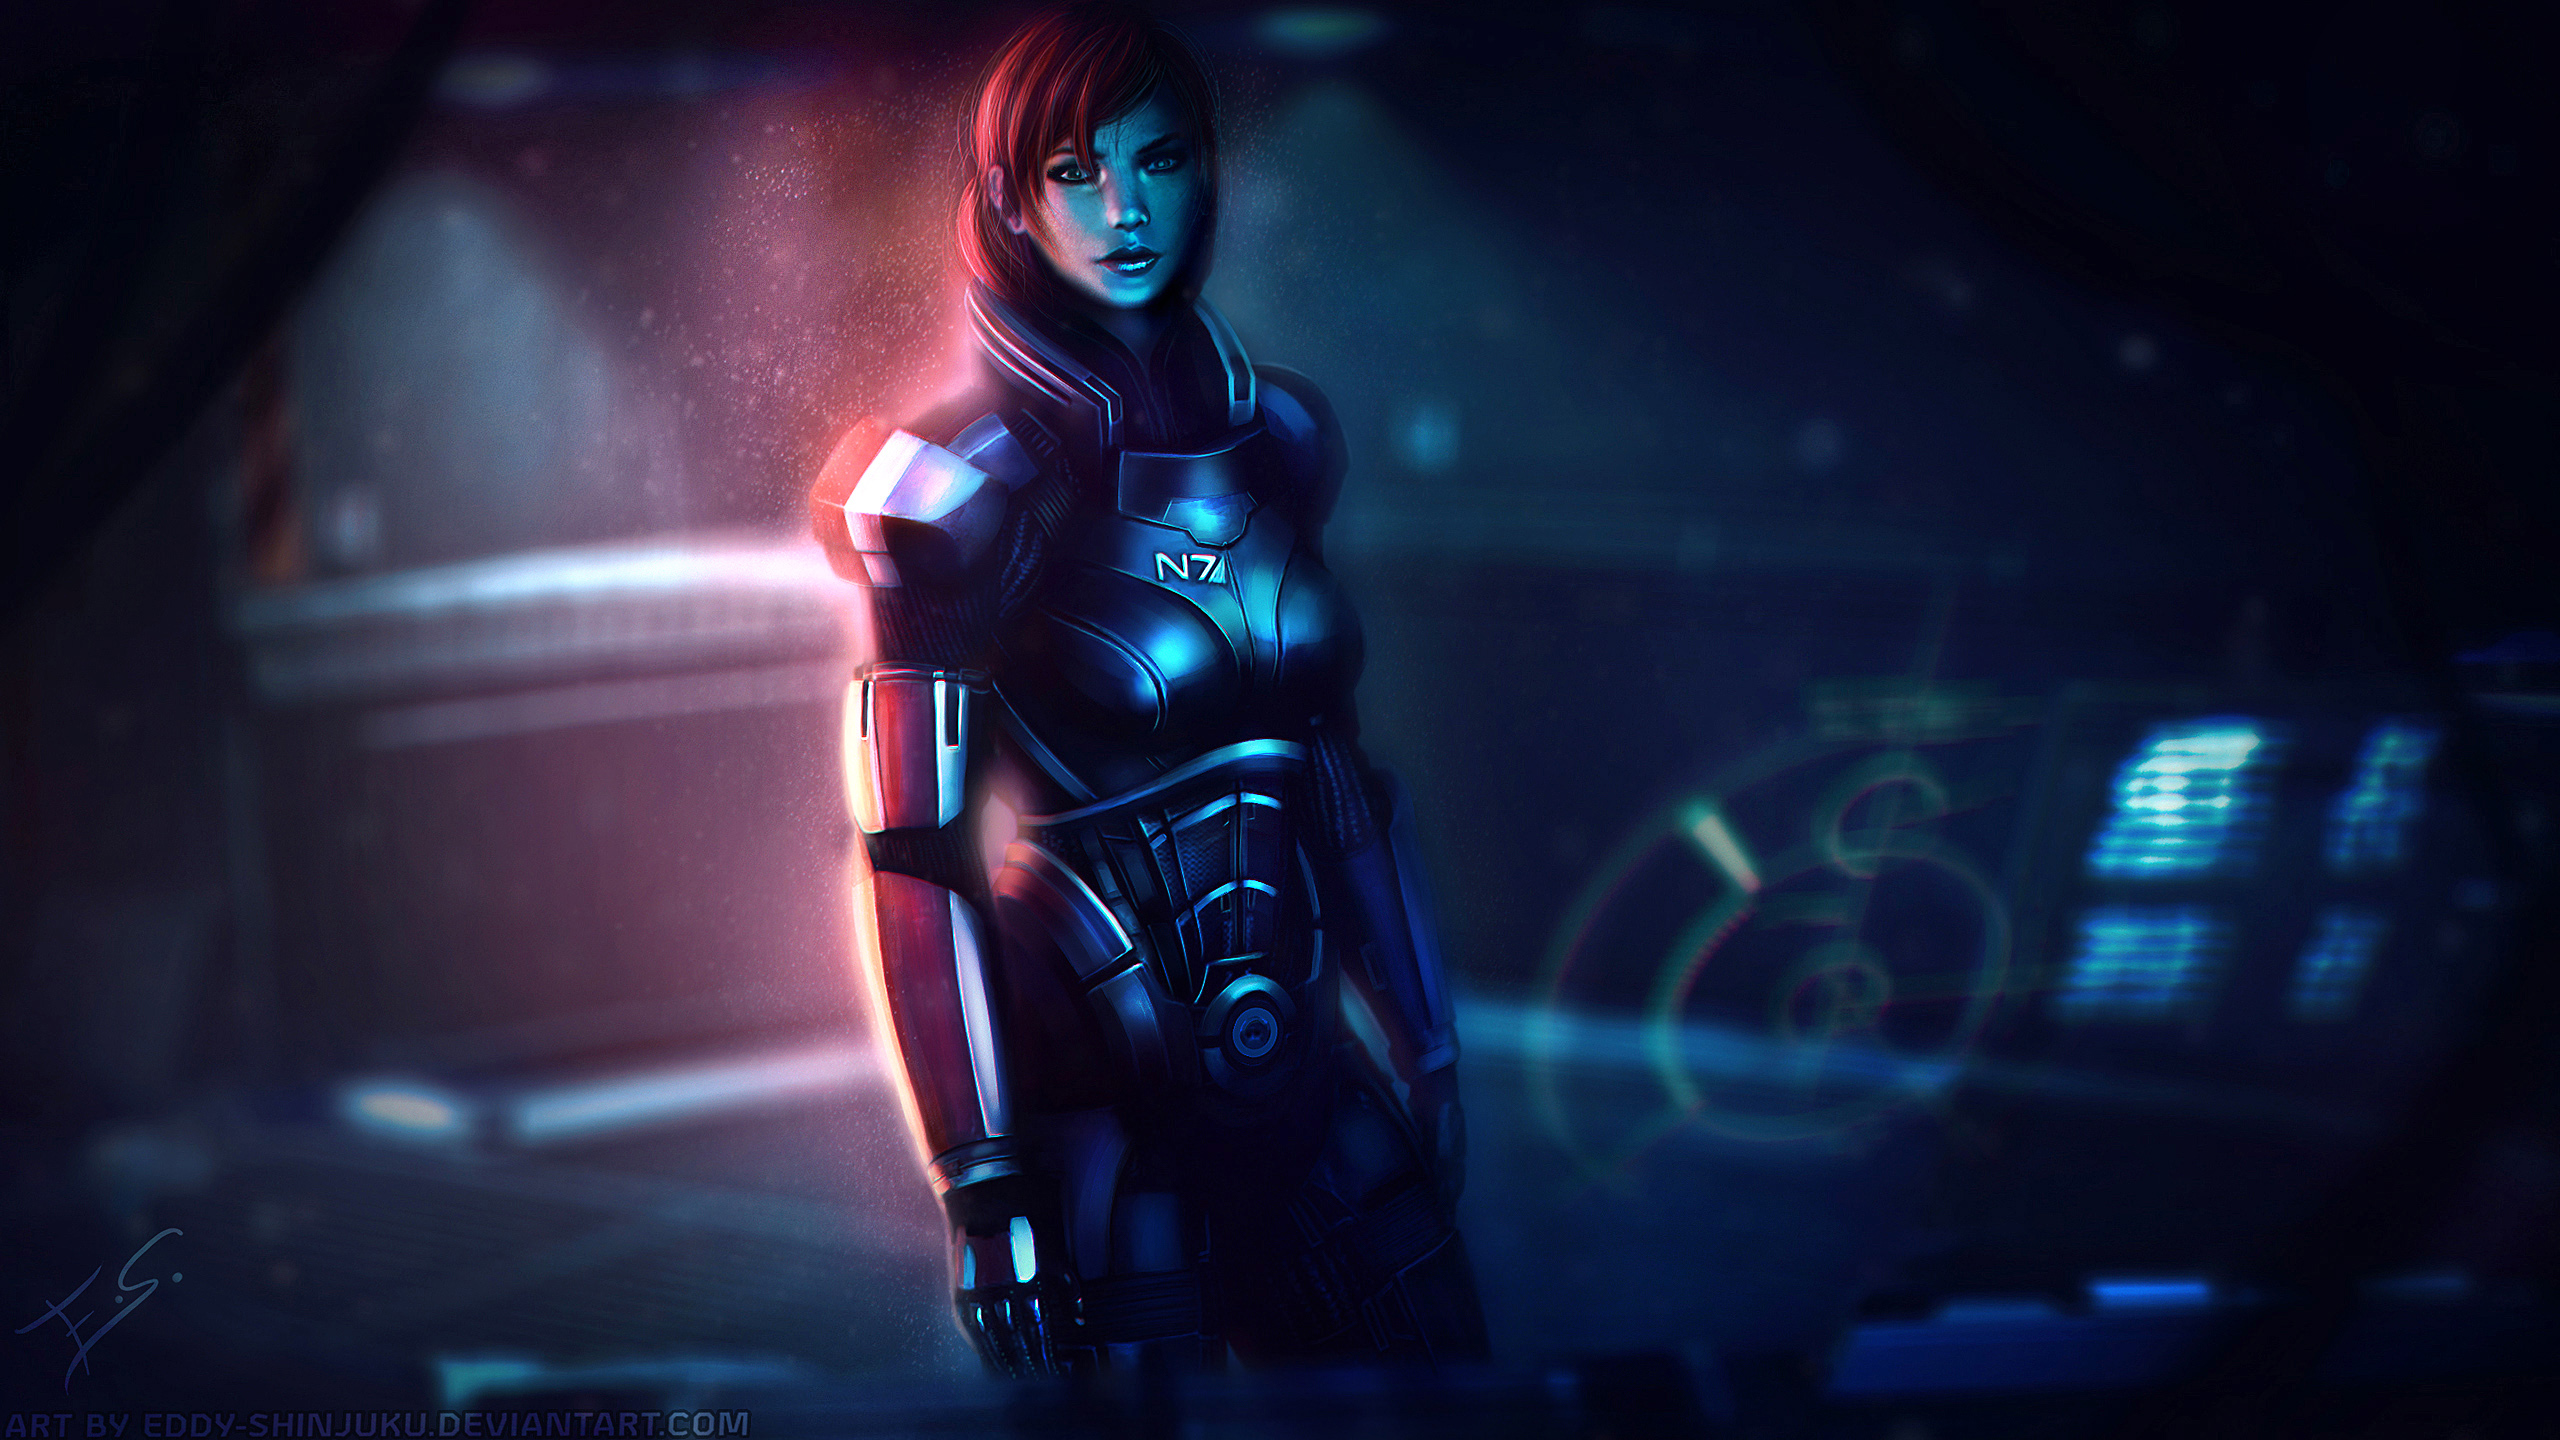 N7: Lady in Red - Mass Effect 3 by Eddy-Shinjuku